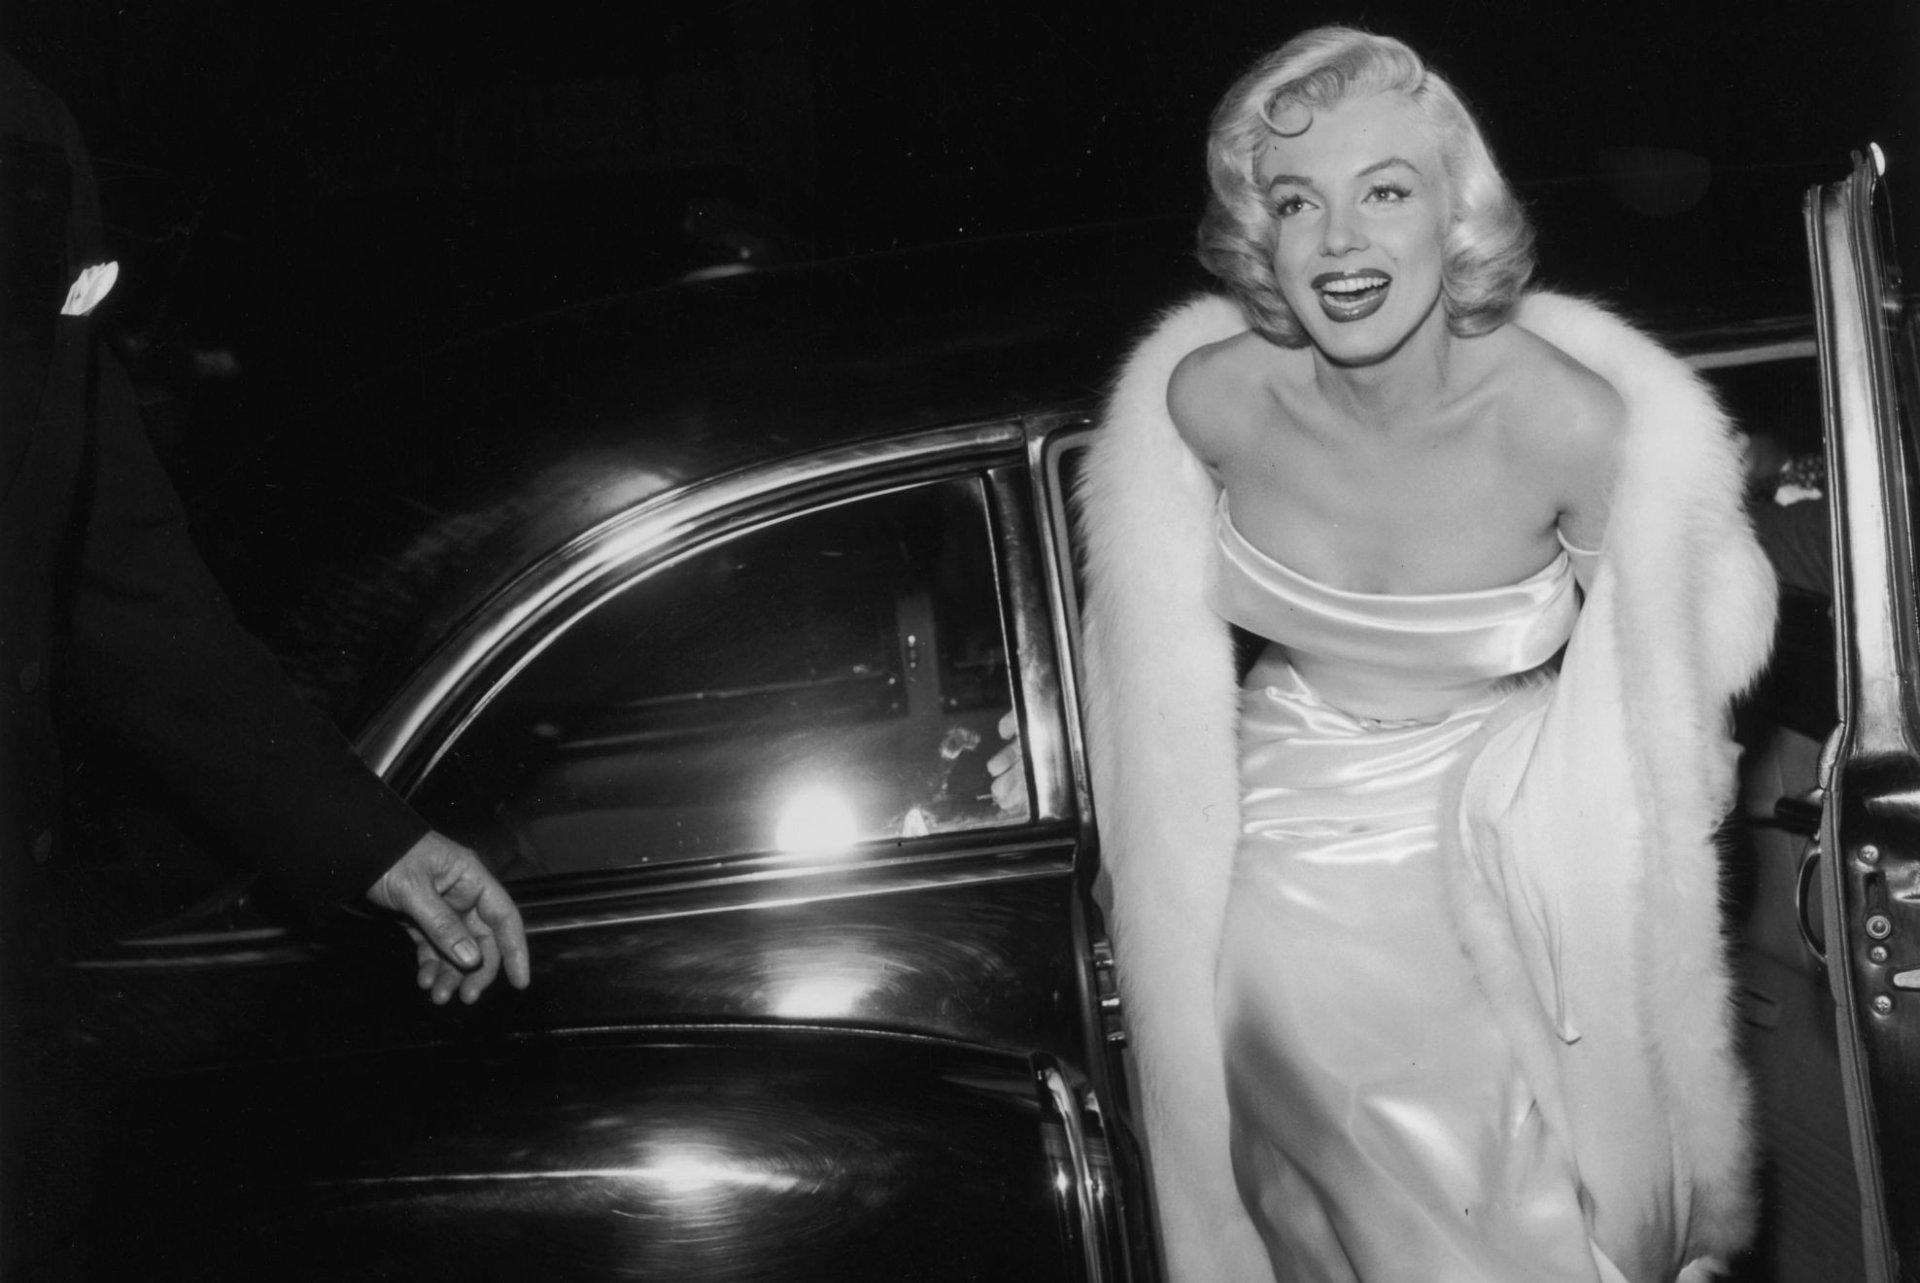 Marilyn monroe hd wallpaper background image 1976x1320 id 167660 wallpaper abyss - Marilyn monroe wallpaper download ...